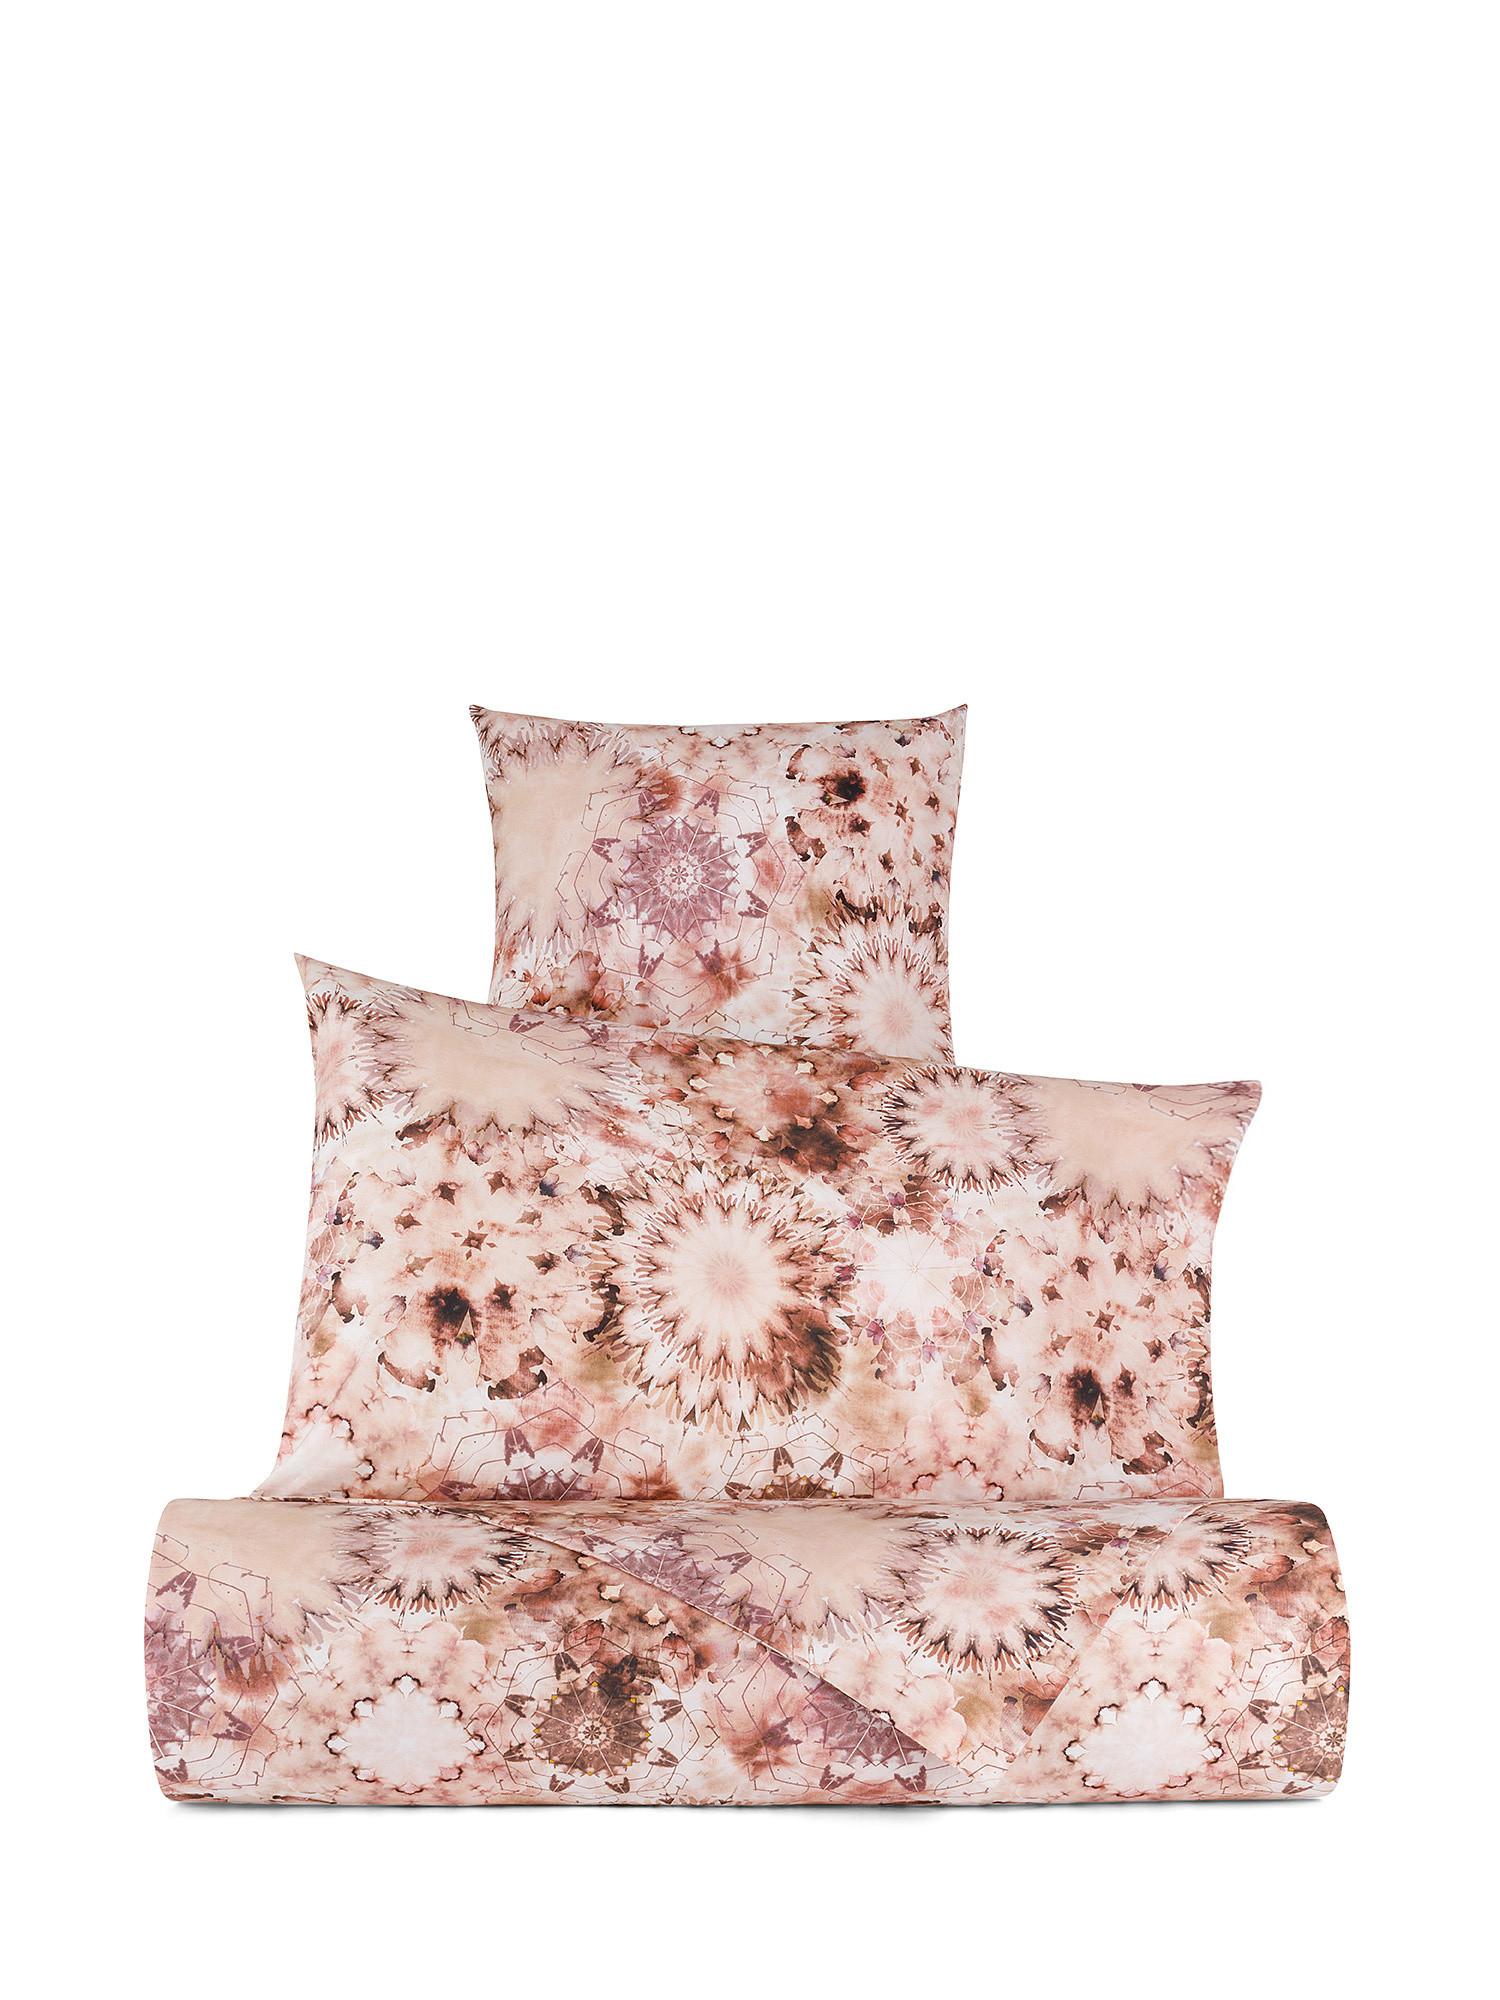 Federa cotone percalle fantasia floreale, Rosa, large image number 1